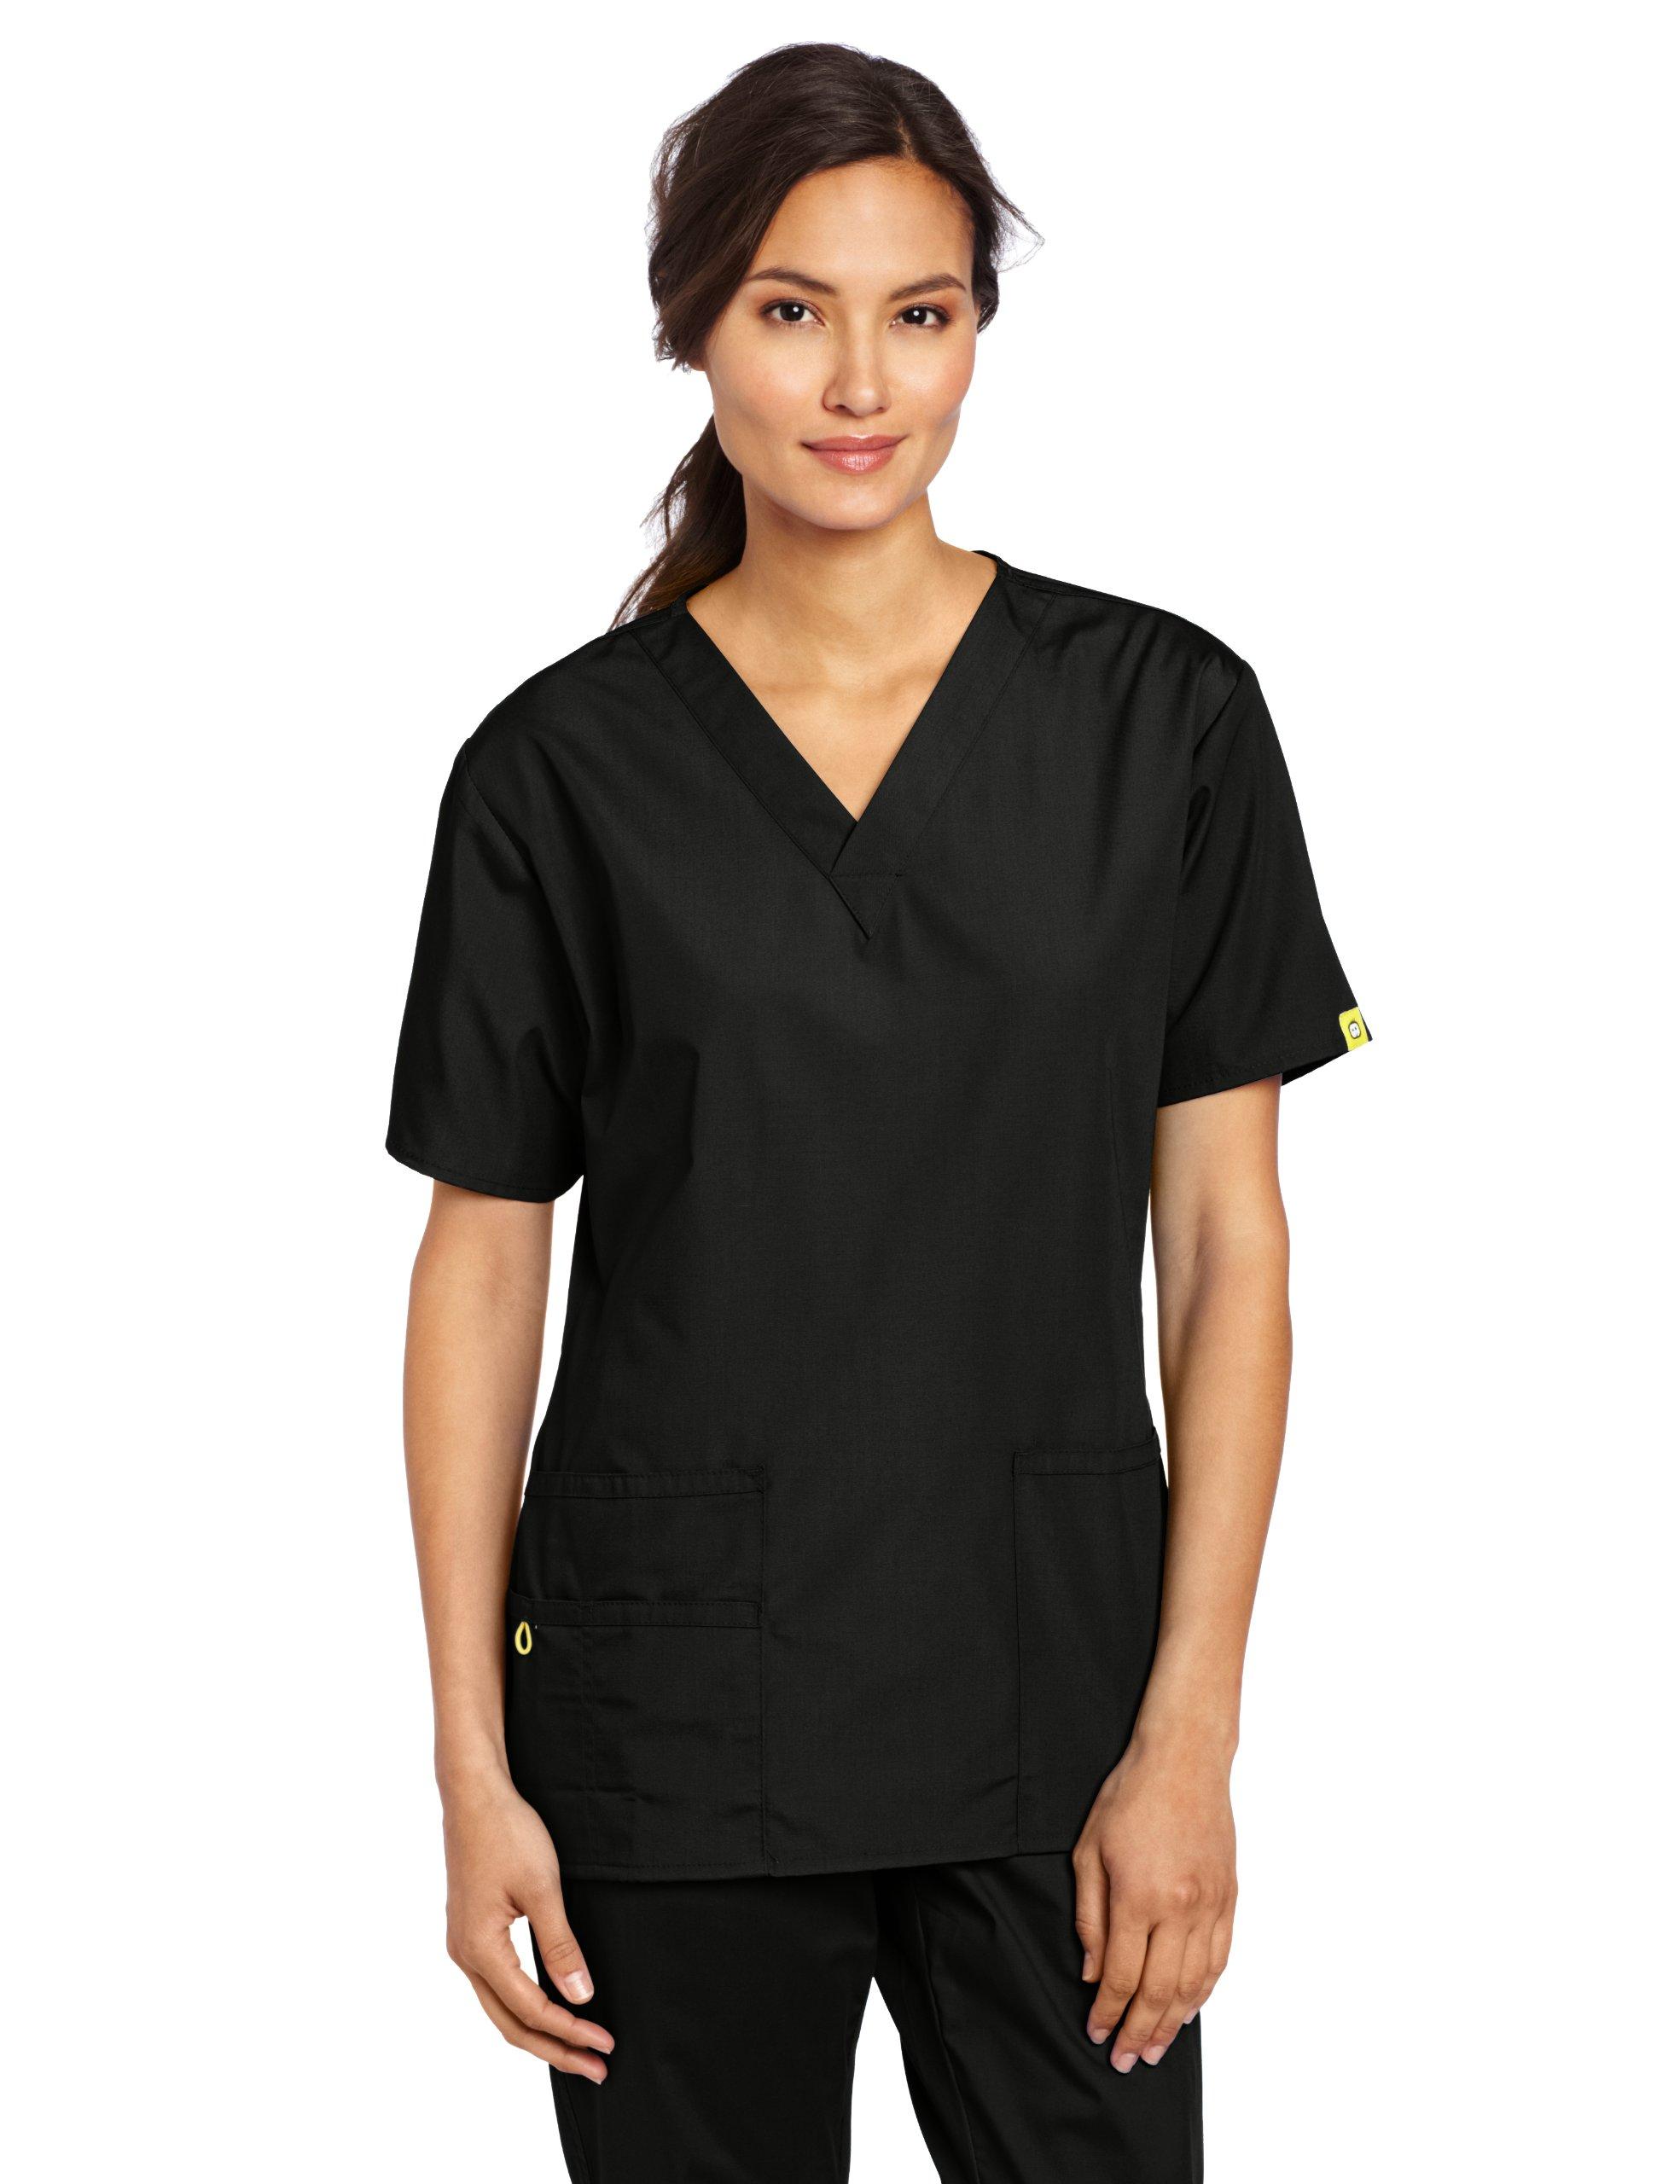 WonderWink Women's Scrubs Bravo 5 Pocket V-Neck Top, Black, Medium by WonderWink